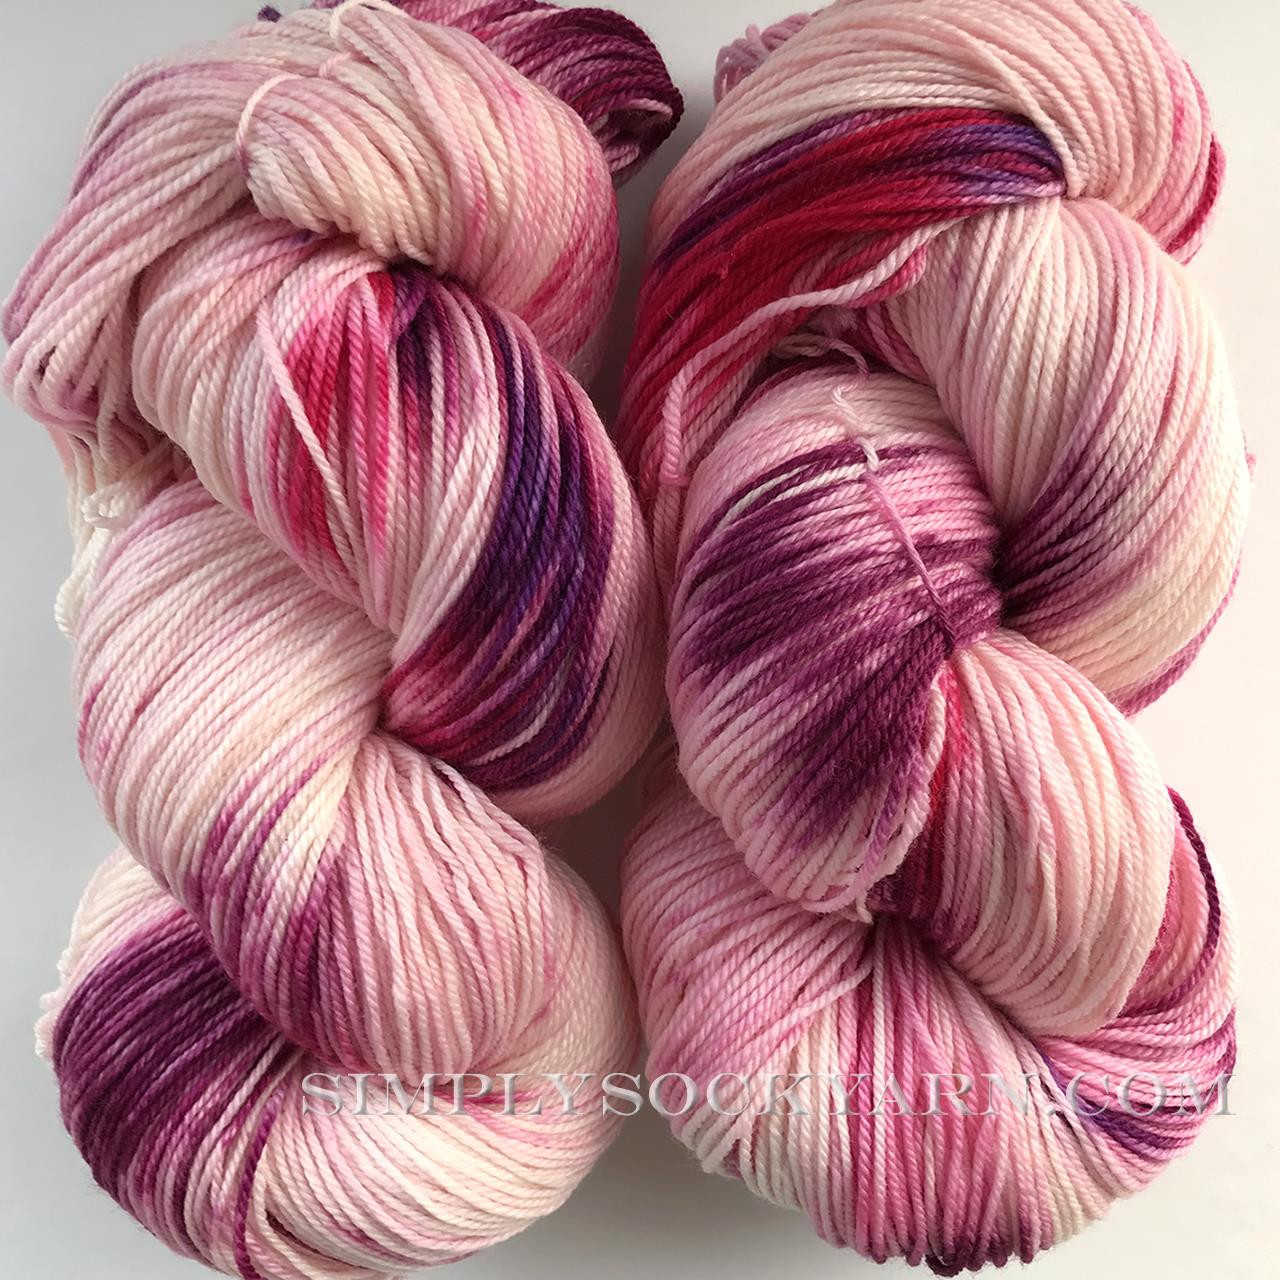 SG TL Sock Raspberry Swirl -